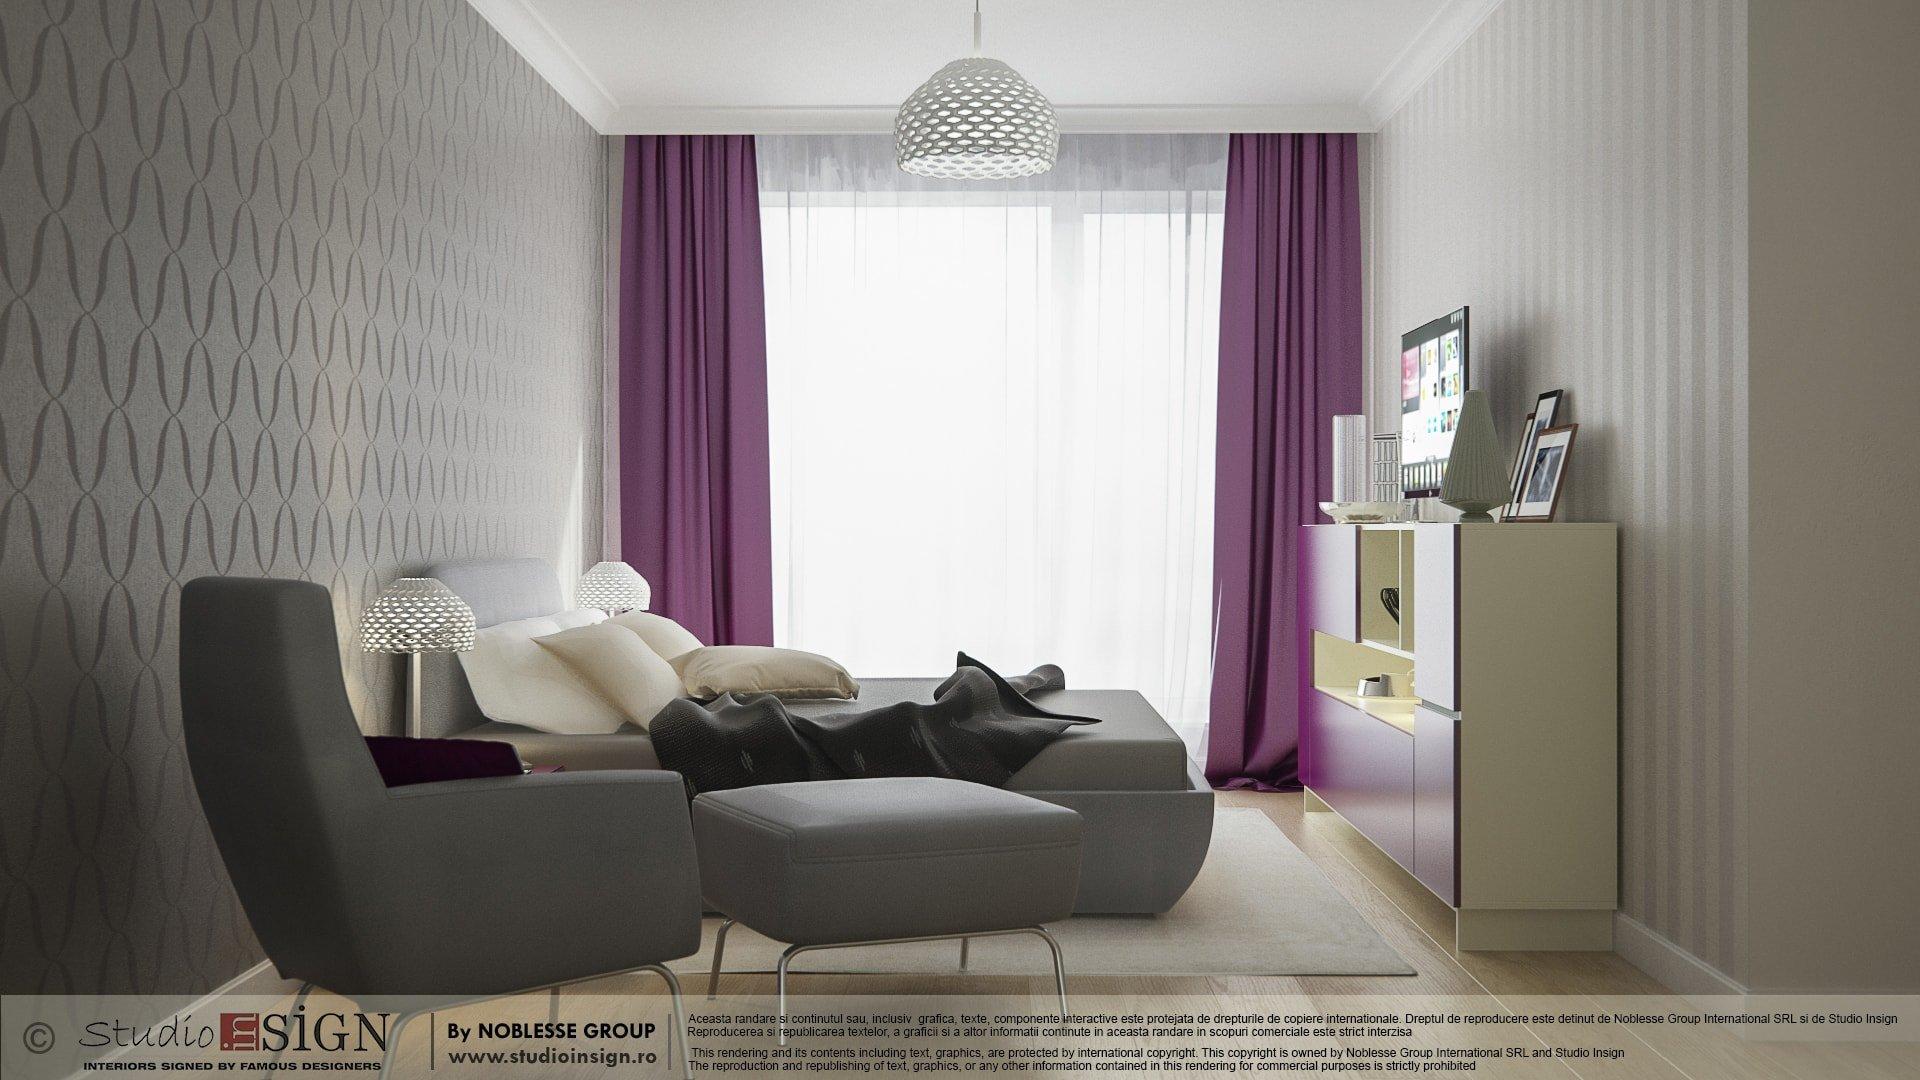 APARTMENT IN BUCHAREST – MODERN INTERIOR DESIGN 1 | Studio inSIGN